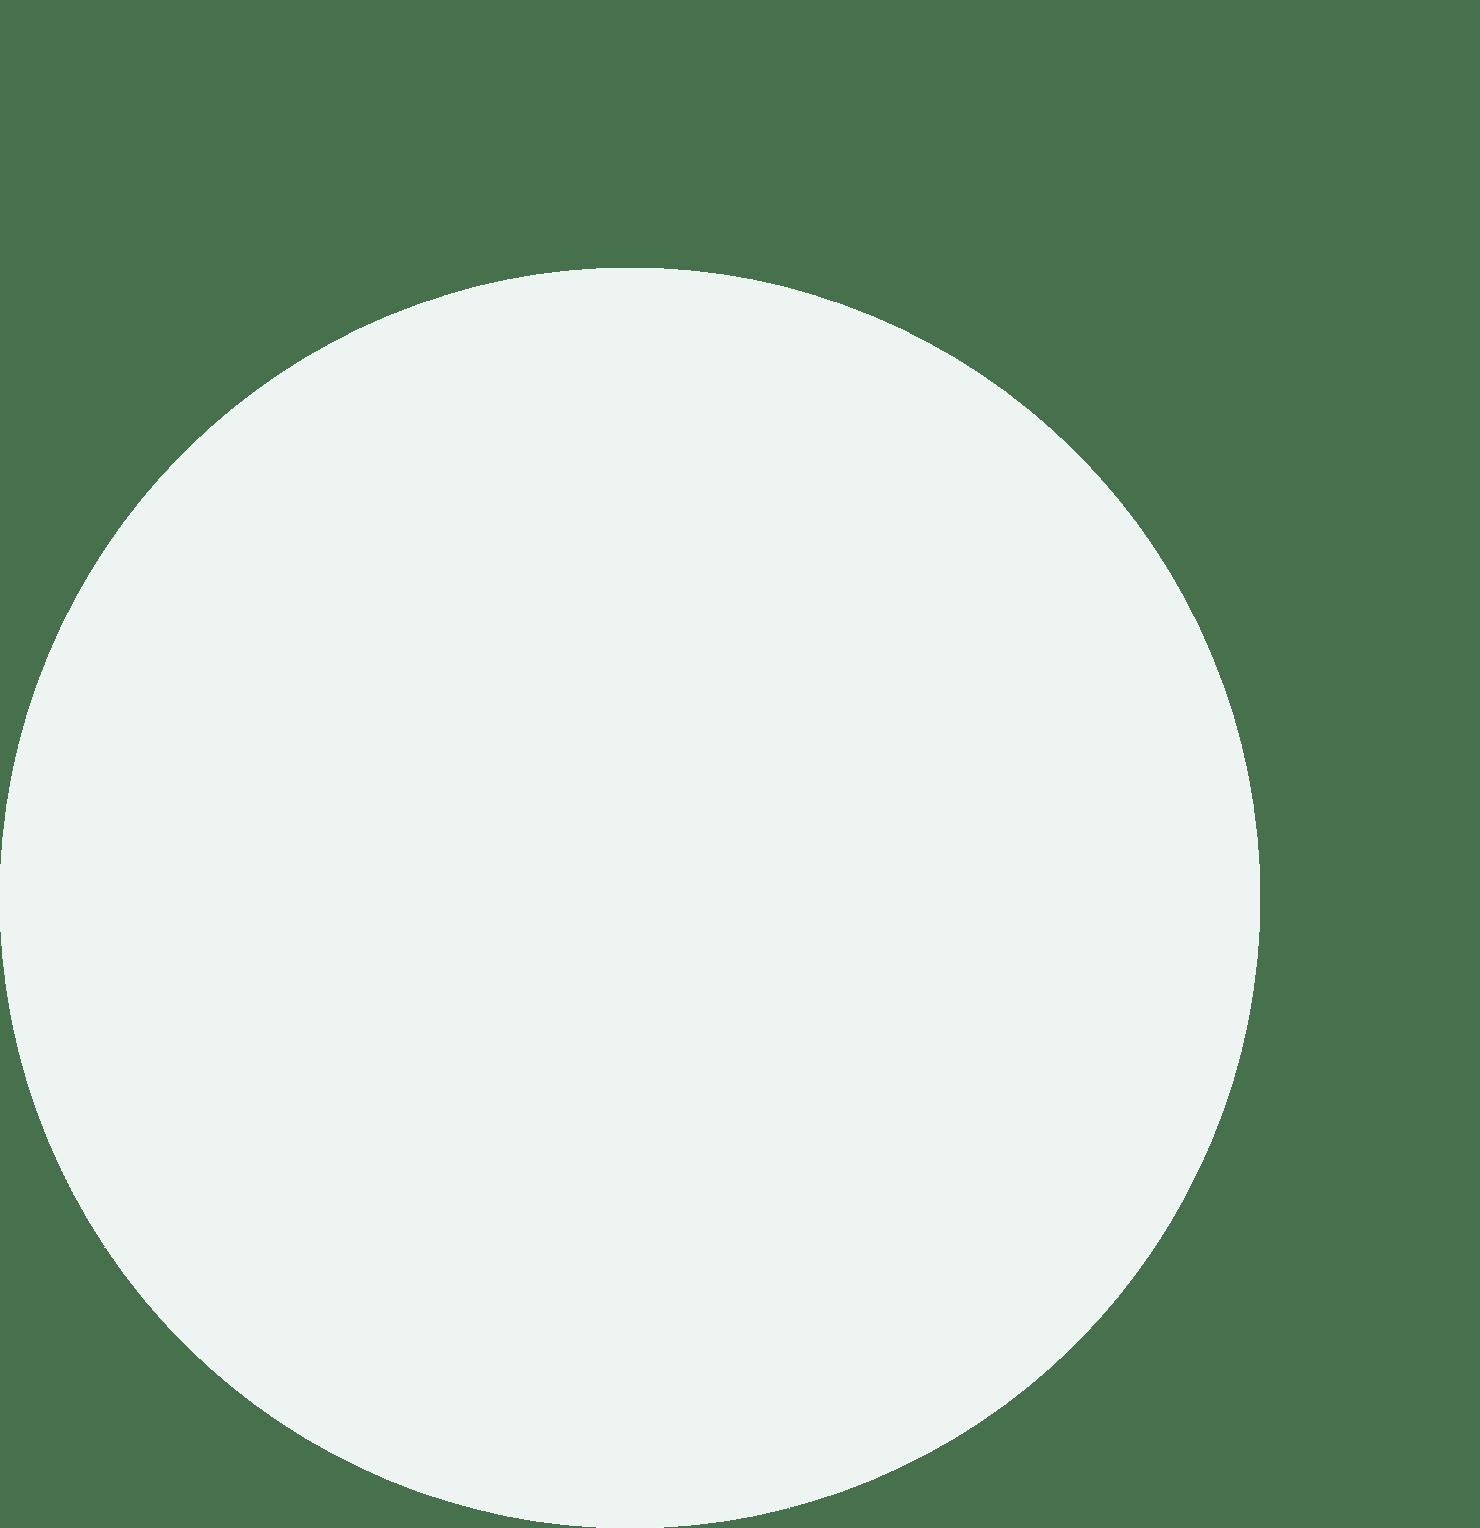 circle-green-seven-min